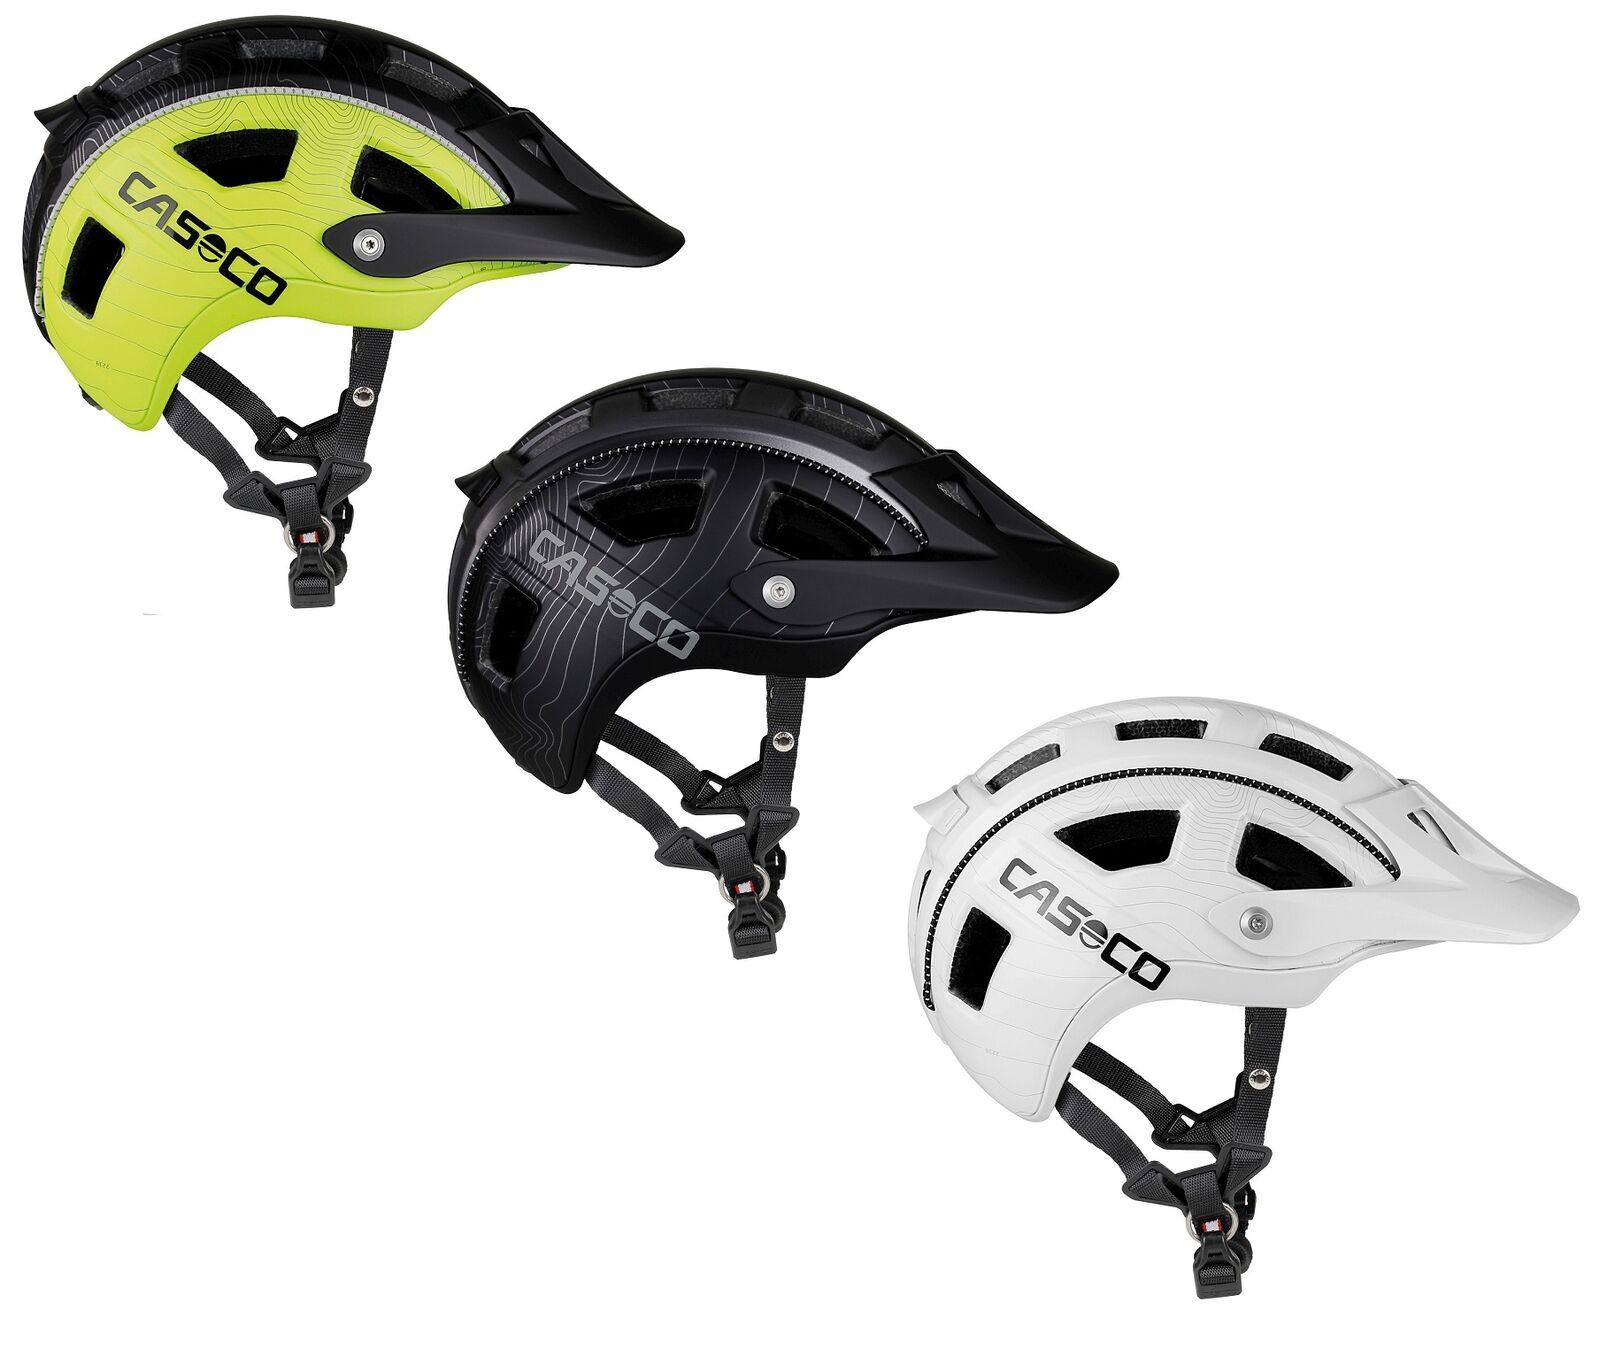 Casco MTB. e mountainbike bicicleta casco ventilado + ajustable, negro blancooo amarillo